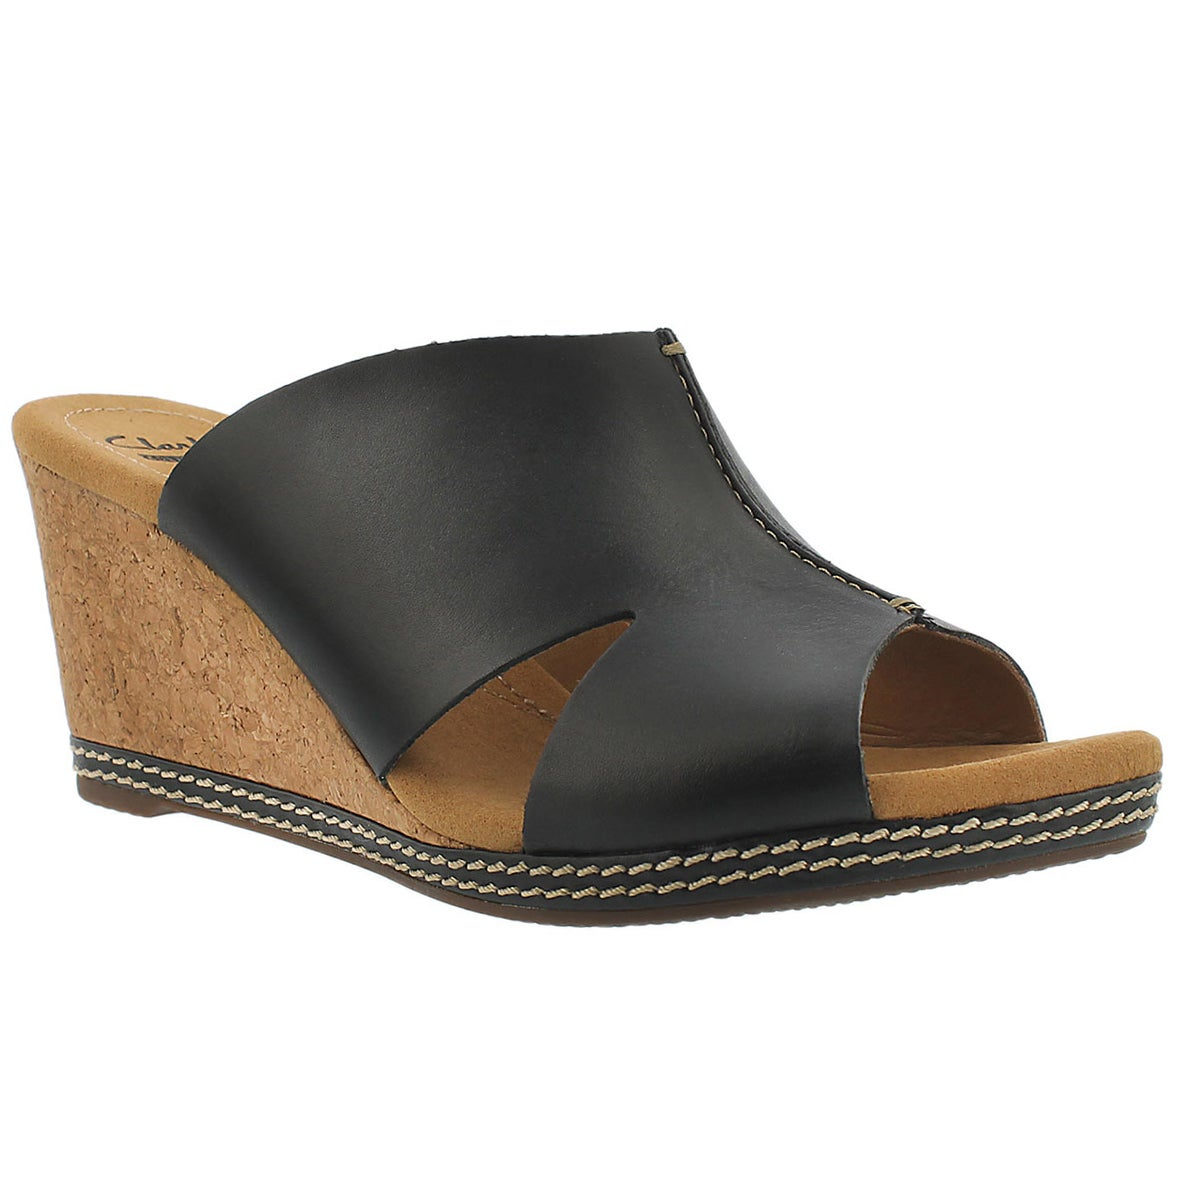 Lds Helio Island blk slide wedge sandal